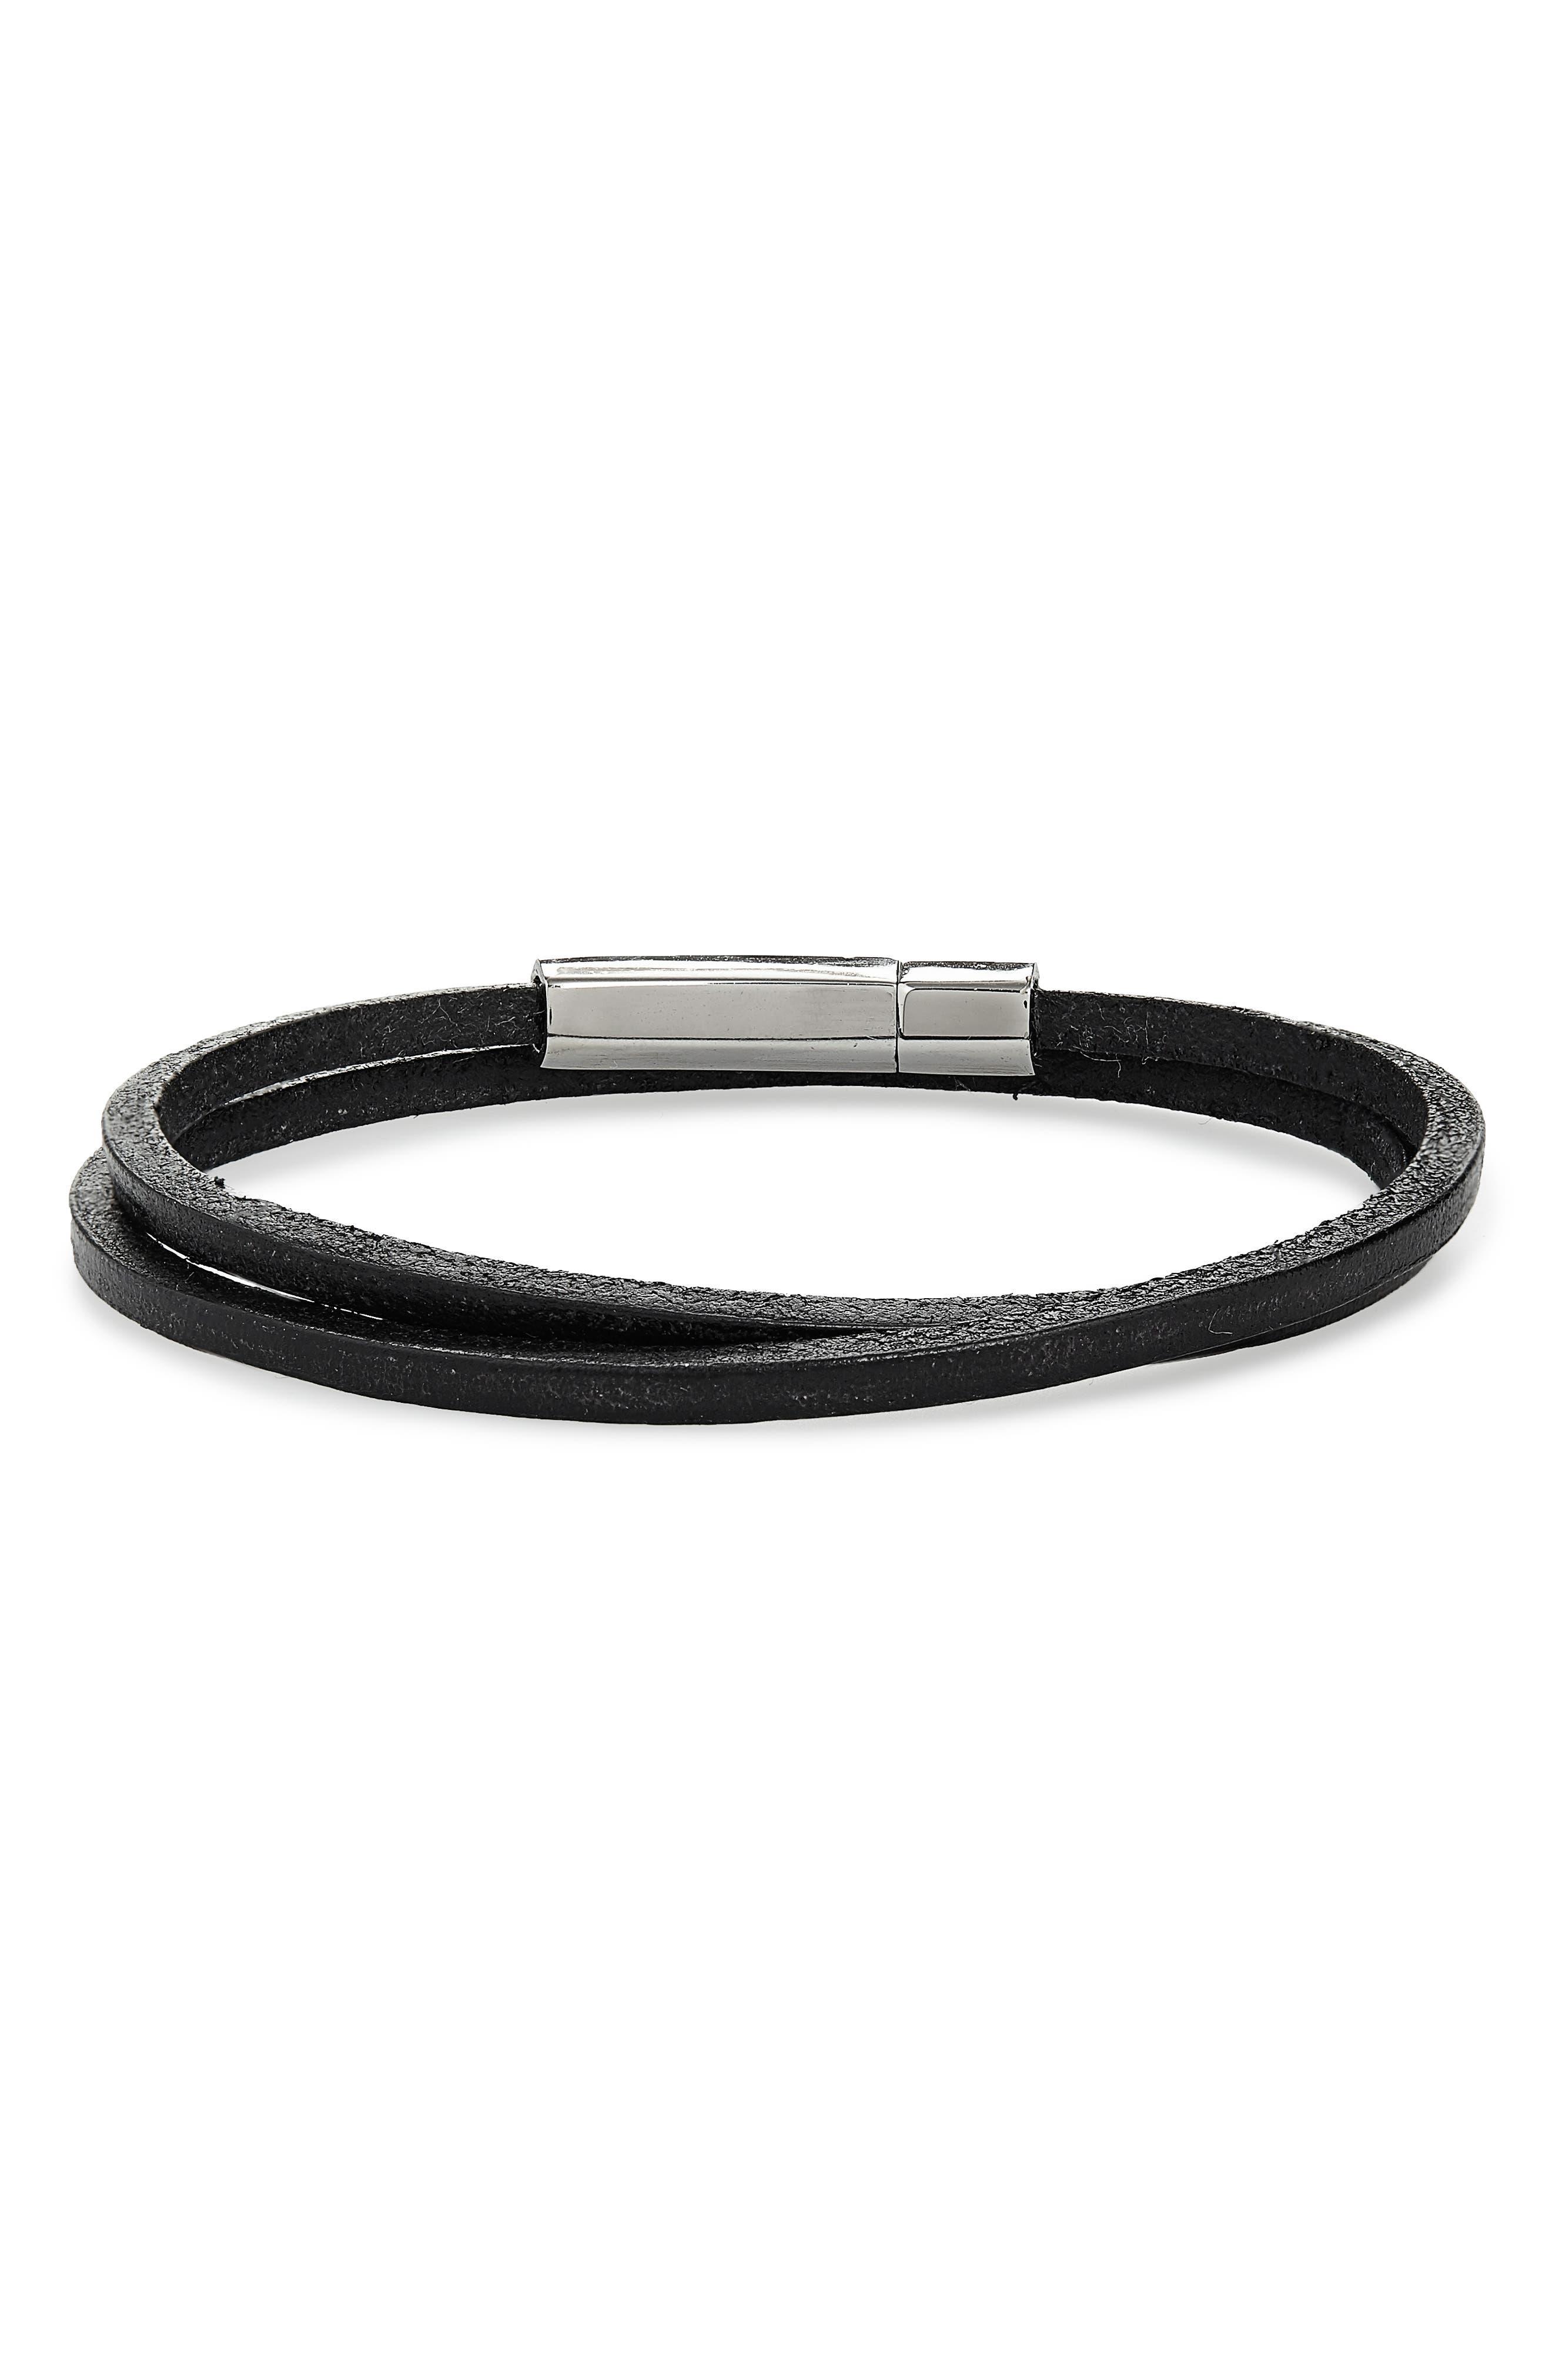 JONAS STUDIO Leather Wrap Bracelet in Black